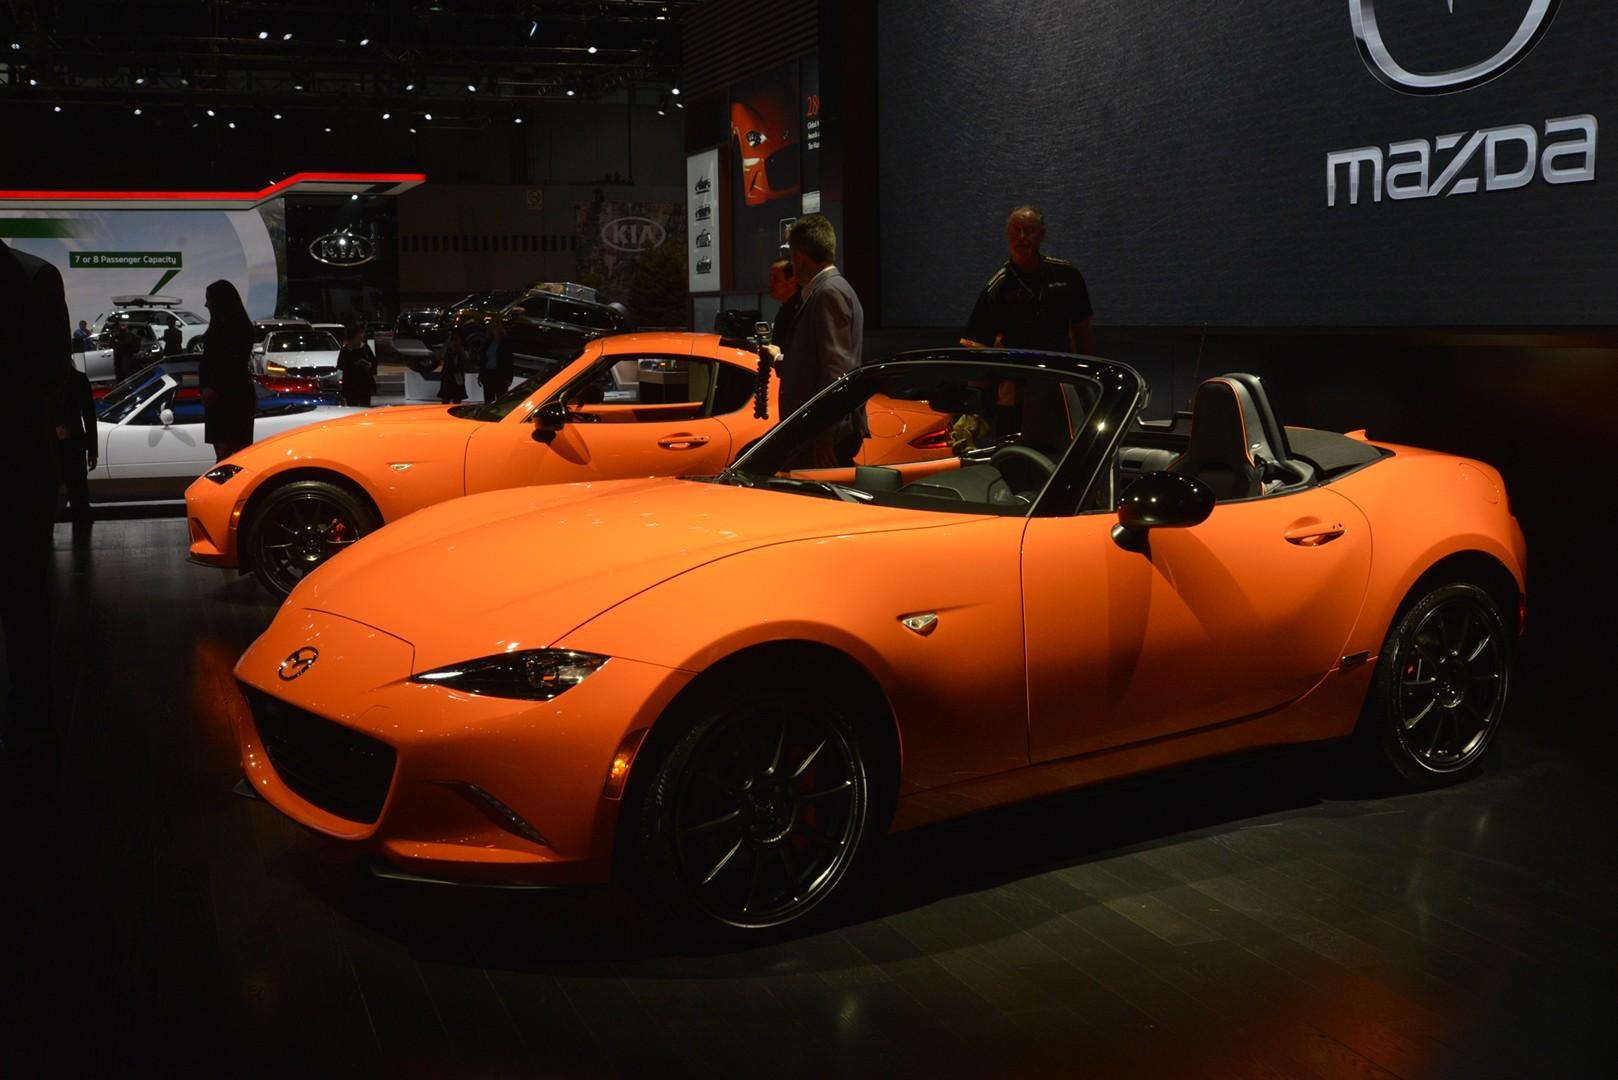 New Mazda MX 5 30th Anniversary Edition Shows Orange Paint